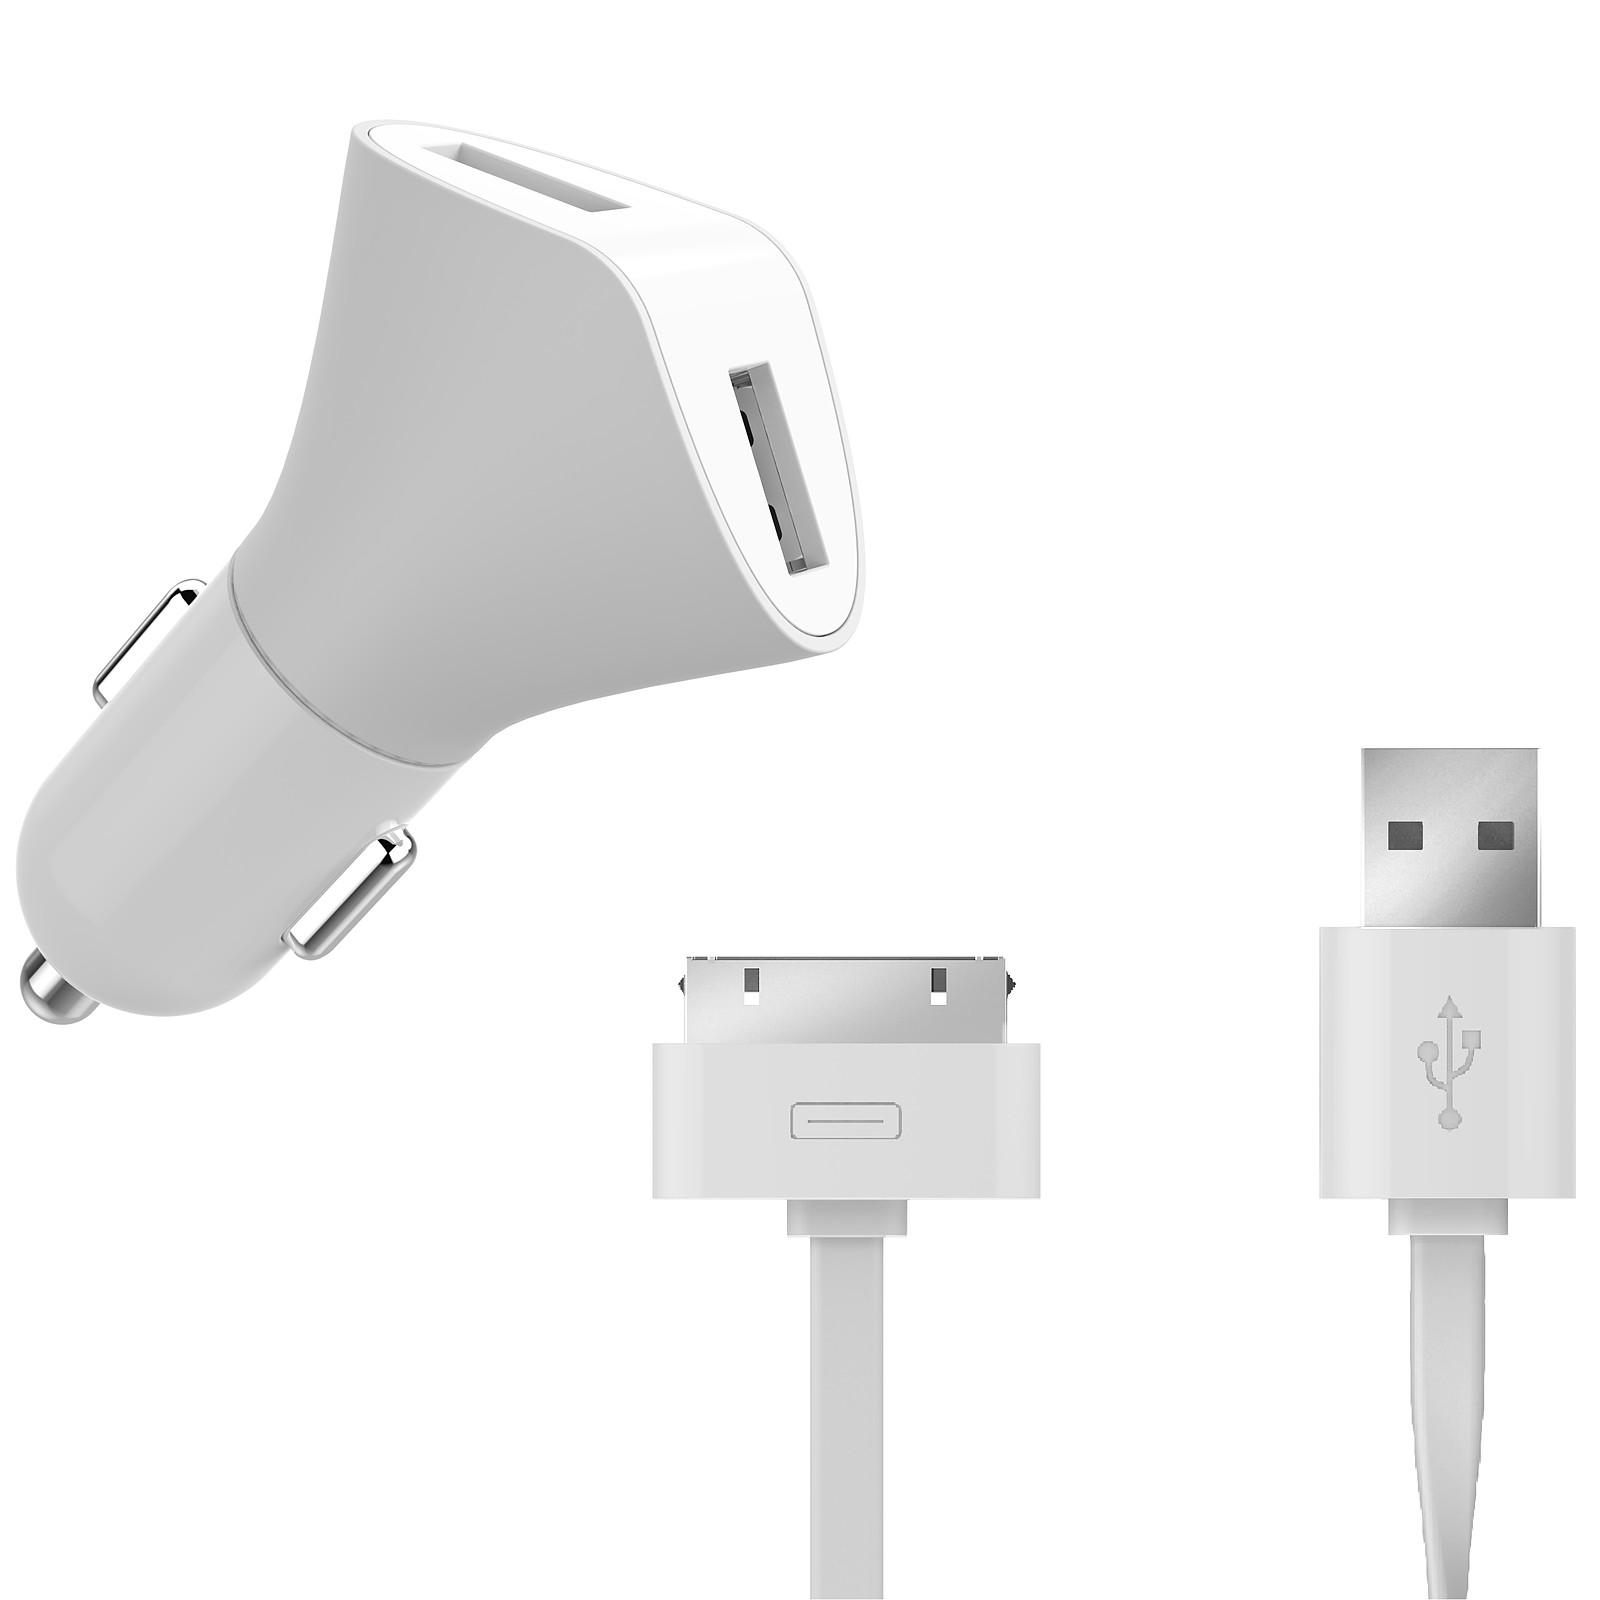 Muvit Chargeur Voiture 2 USB 2.4A Blanc + Câble plat Lightning